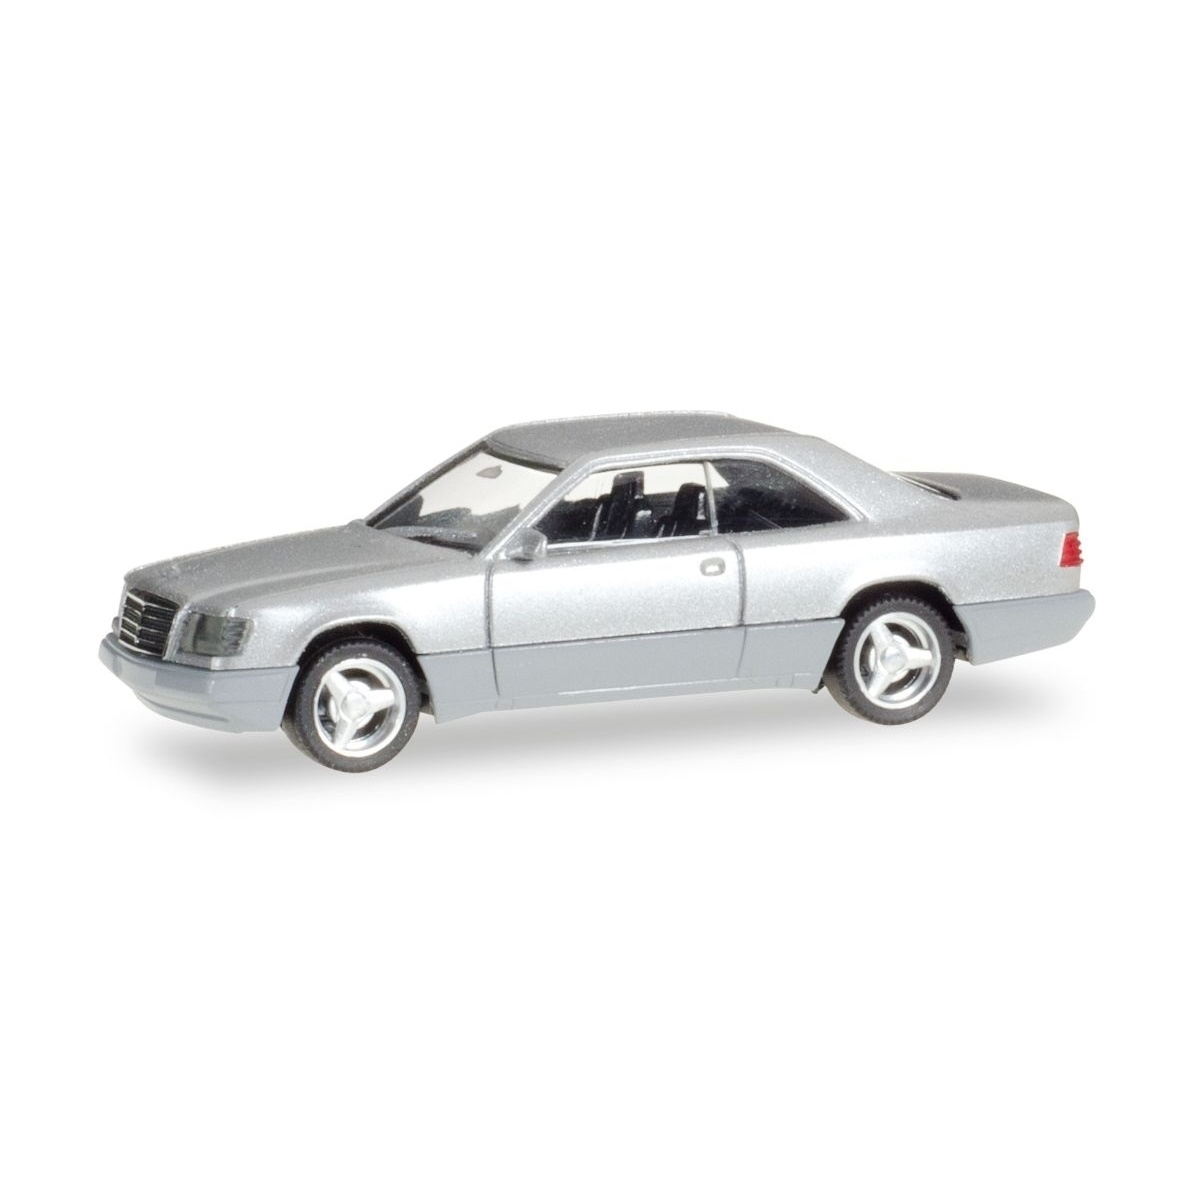 1//87 Herpa MB Mercedes-Benz E 320 Coupé schwarz 028813